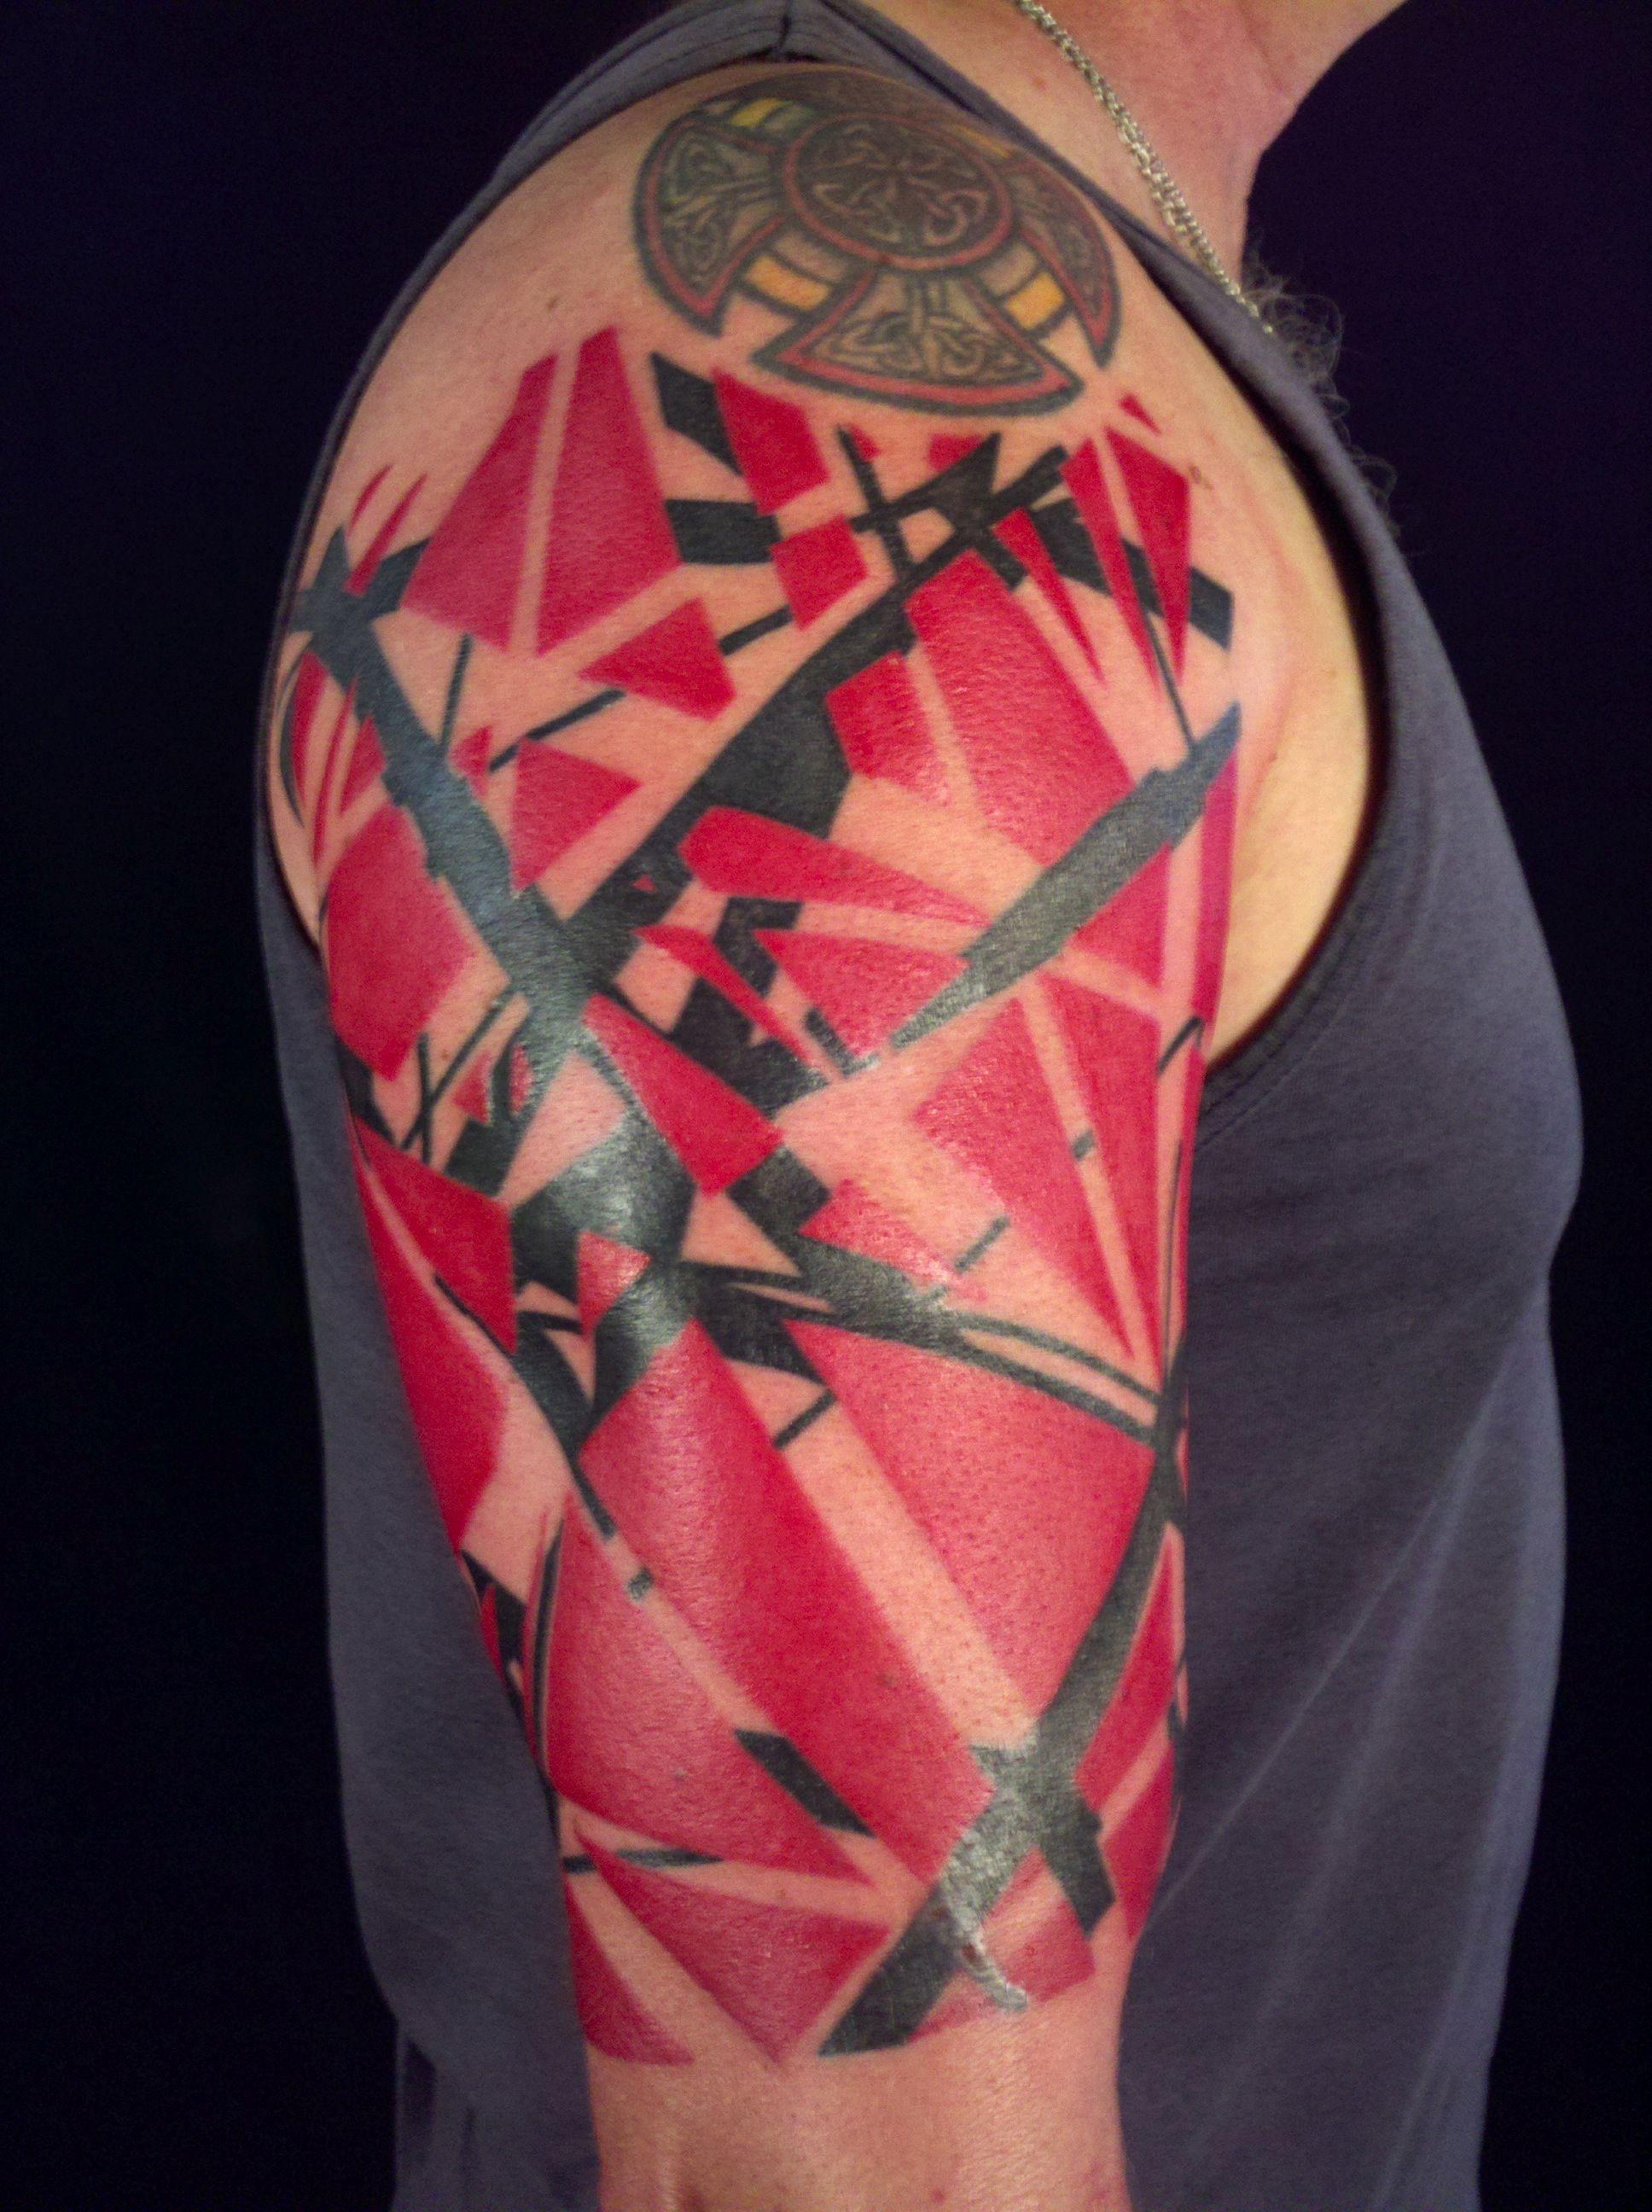 Van Halen Tatoo Tattoo On Tatuagens